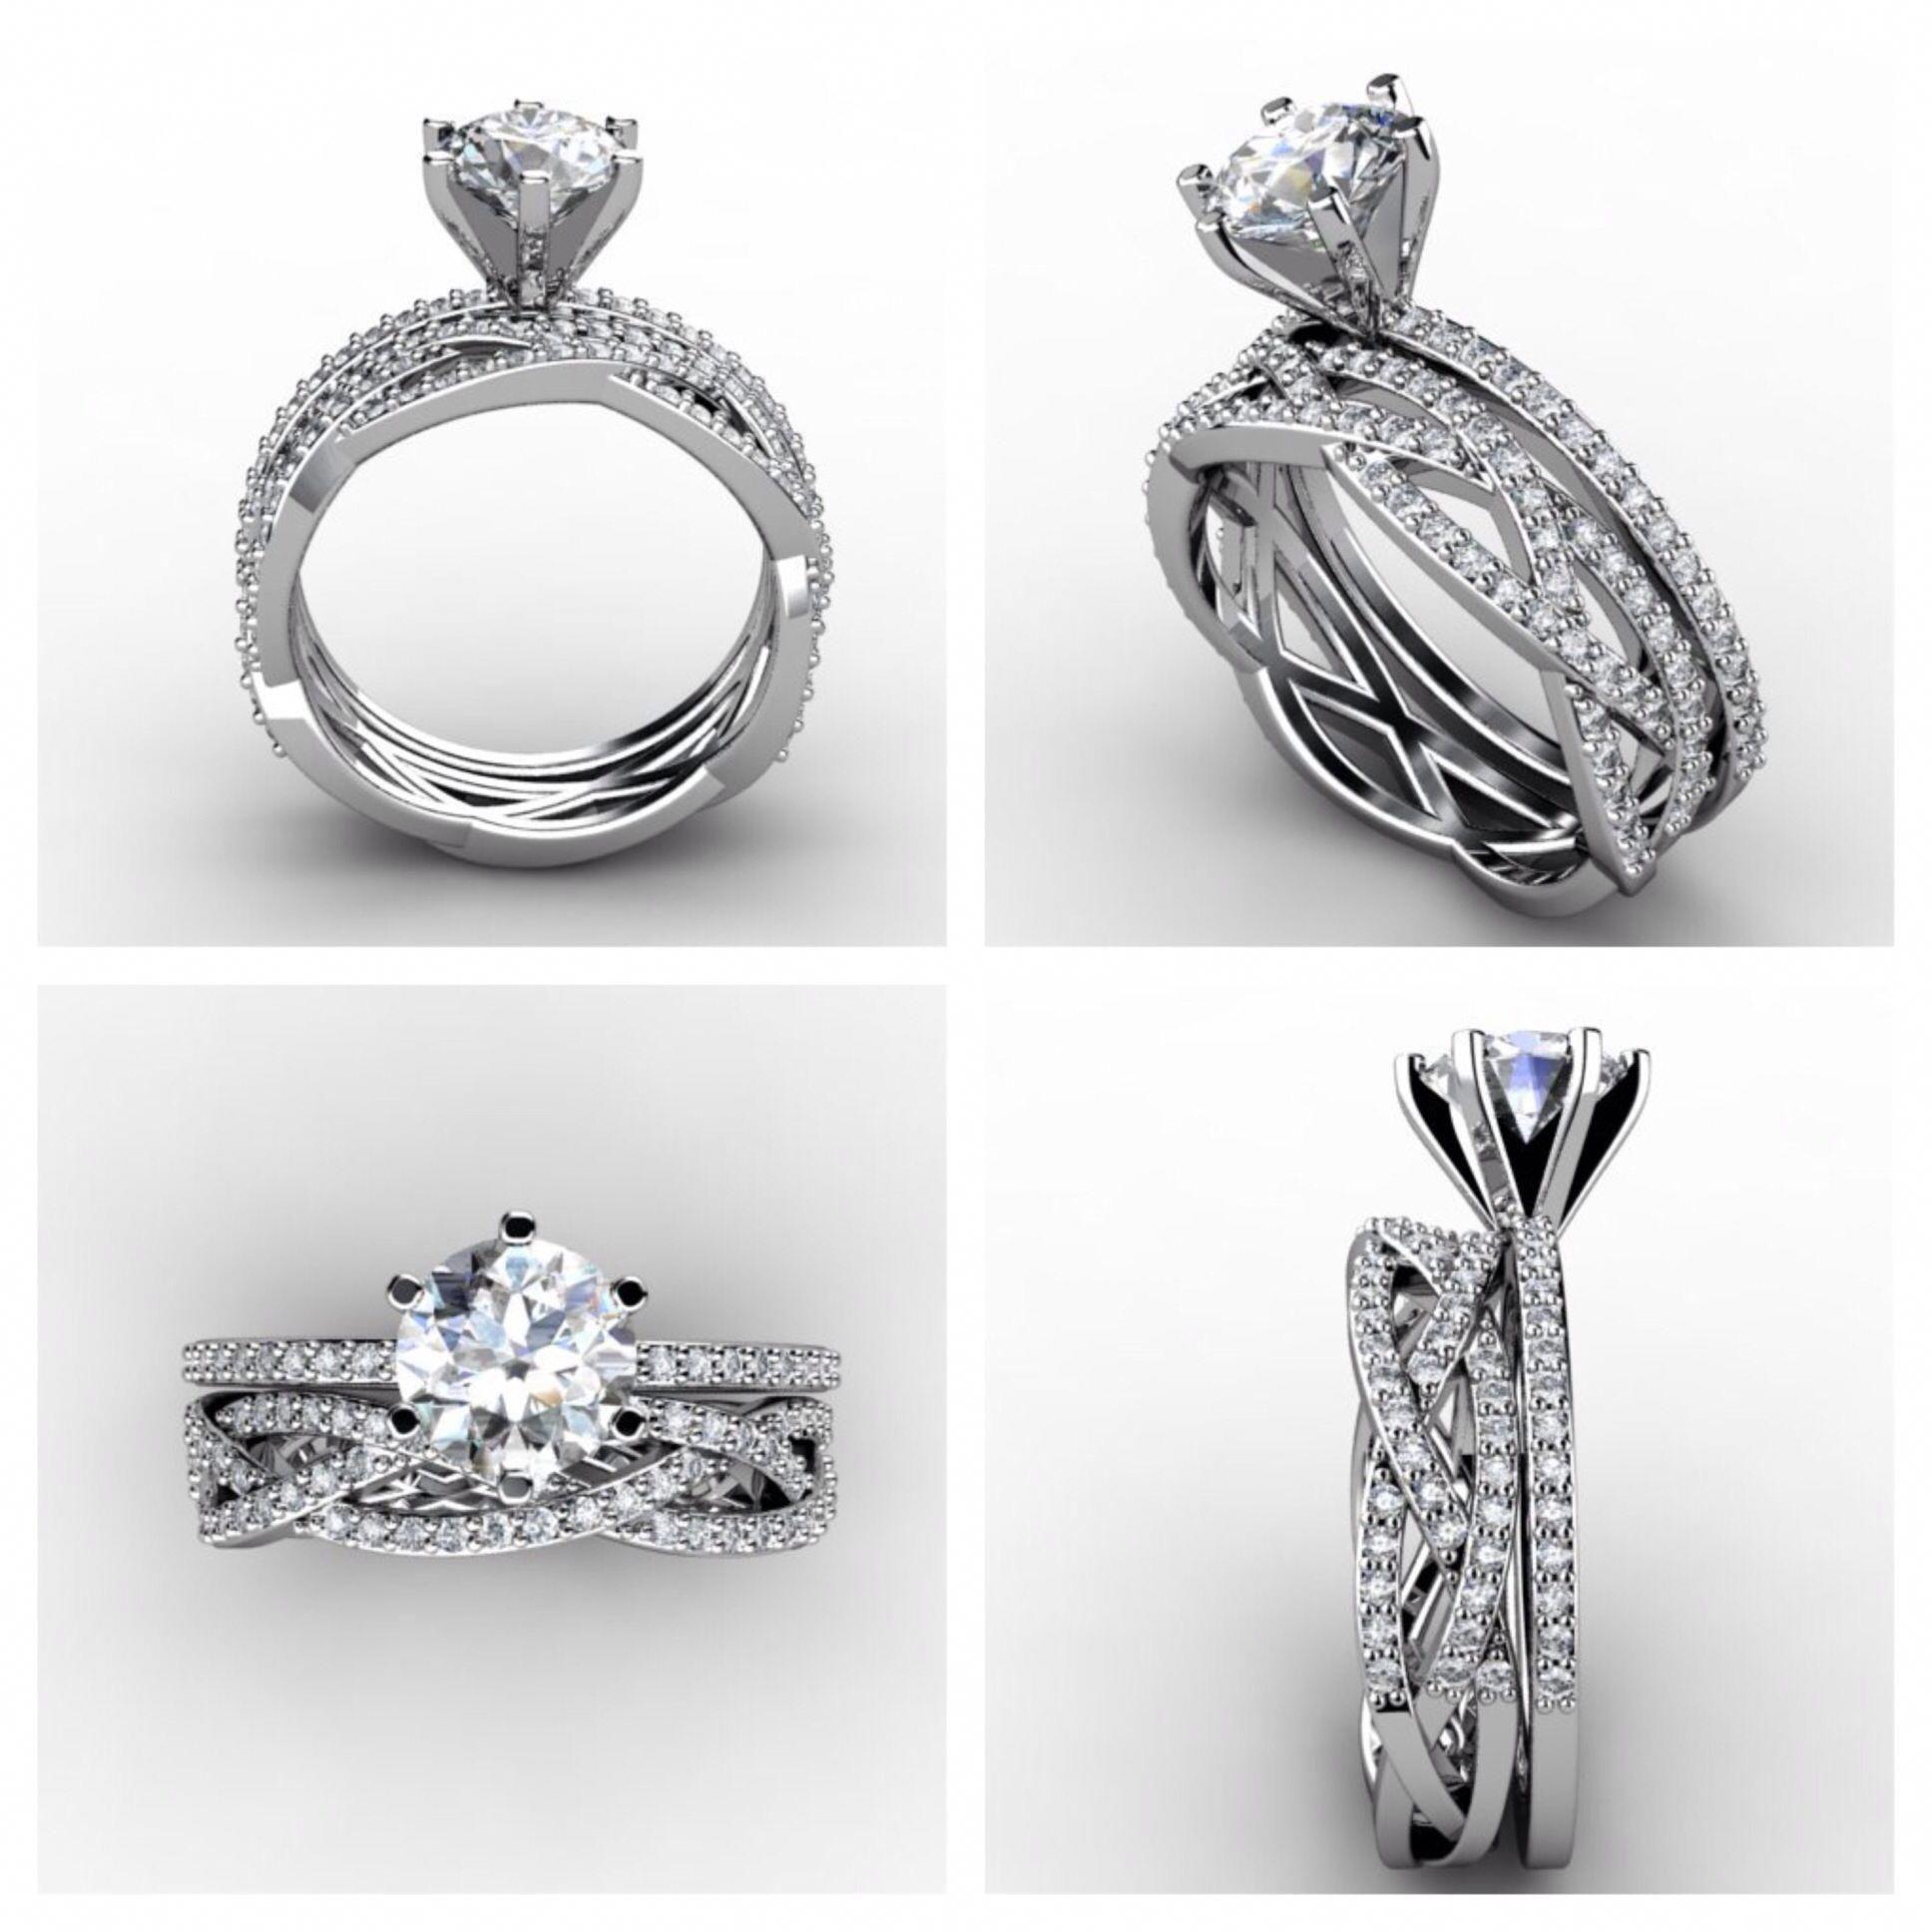 Finest solitaire wedding ring solitaireweddingring